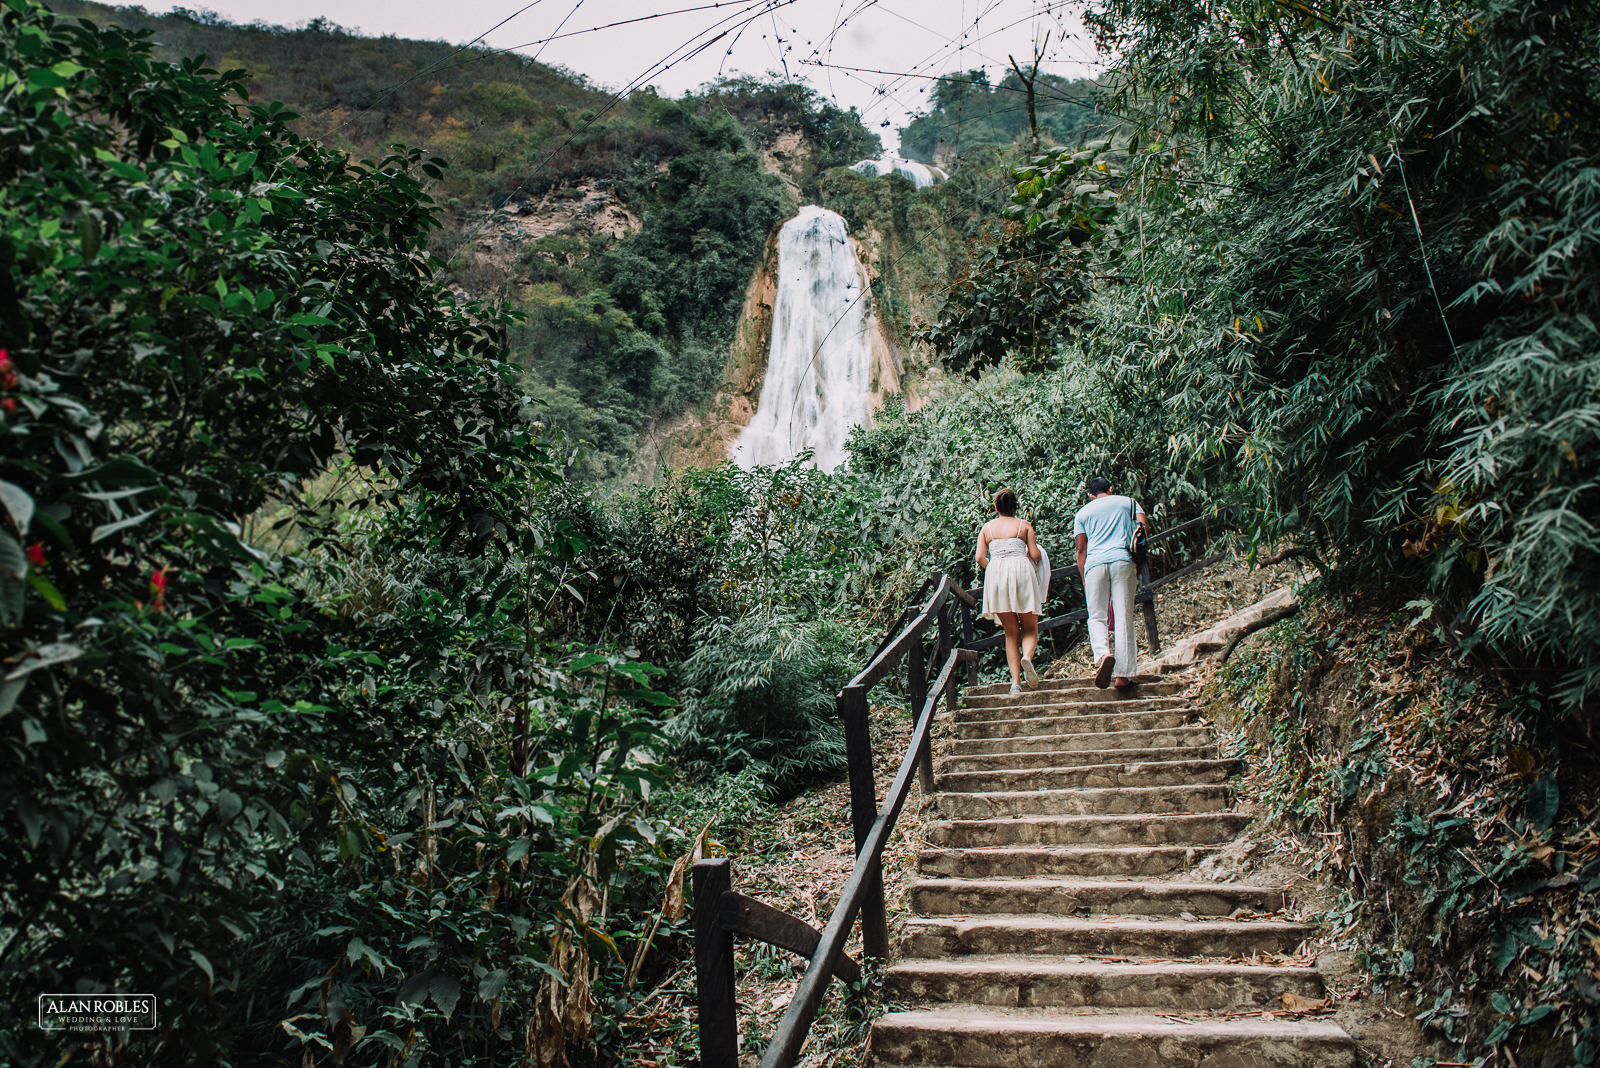 Fotografo de bodas Alan Robles-Pre boda Chiapas-9